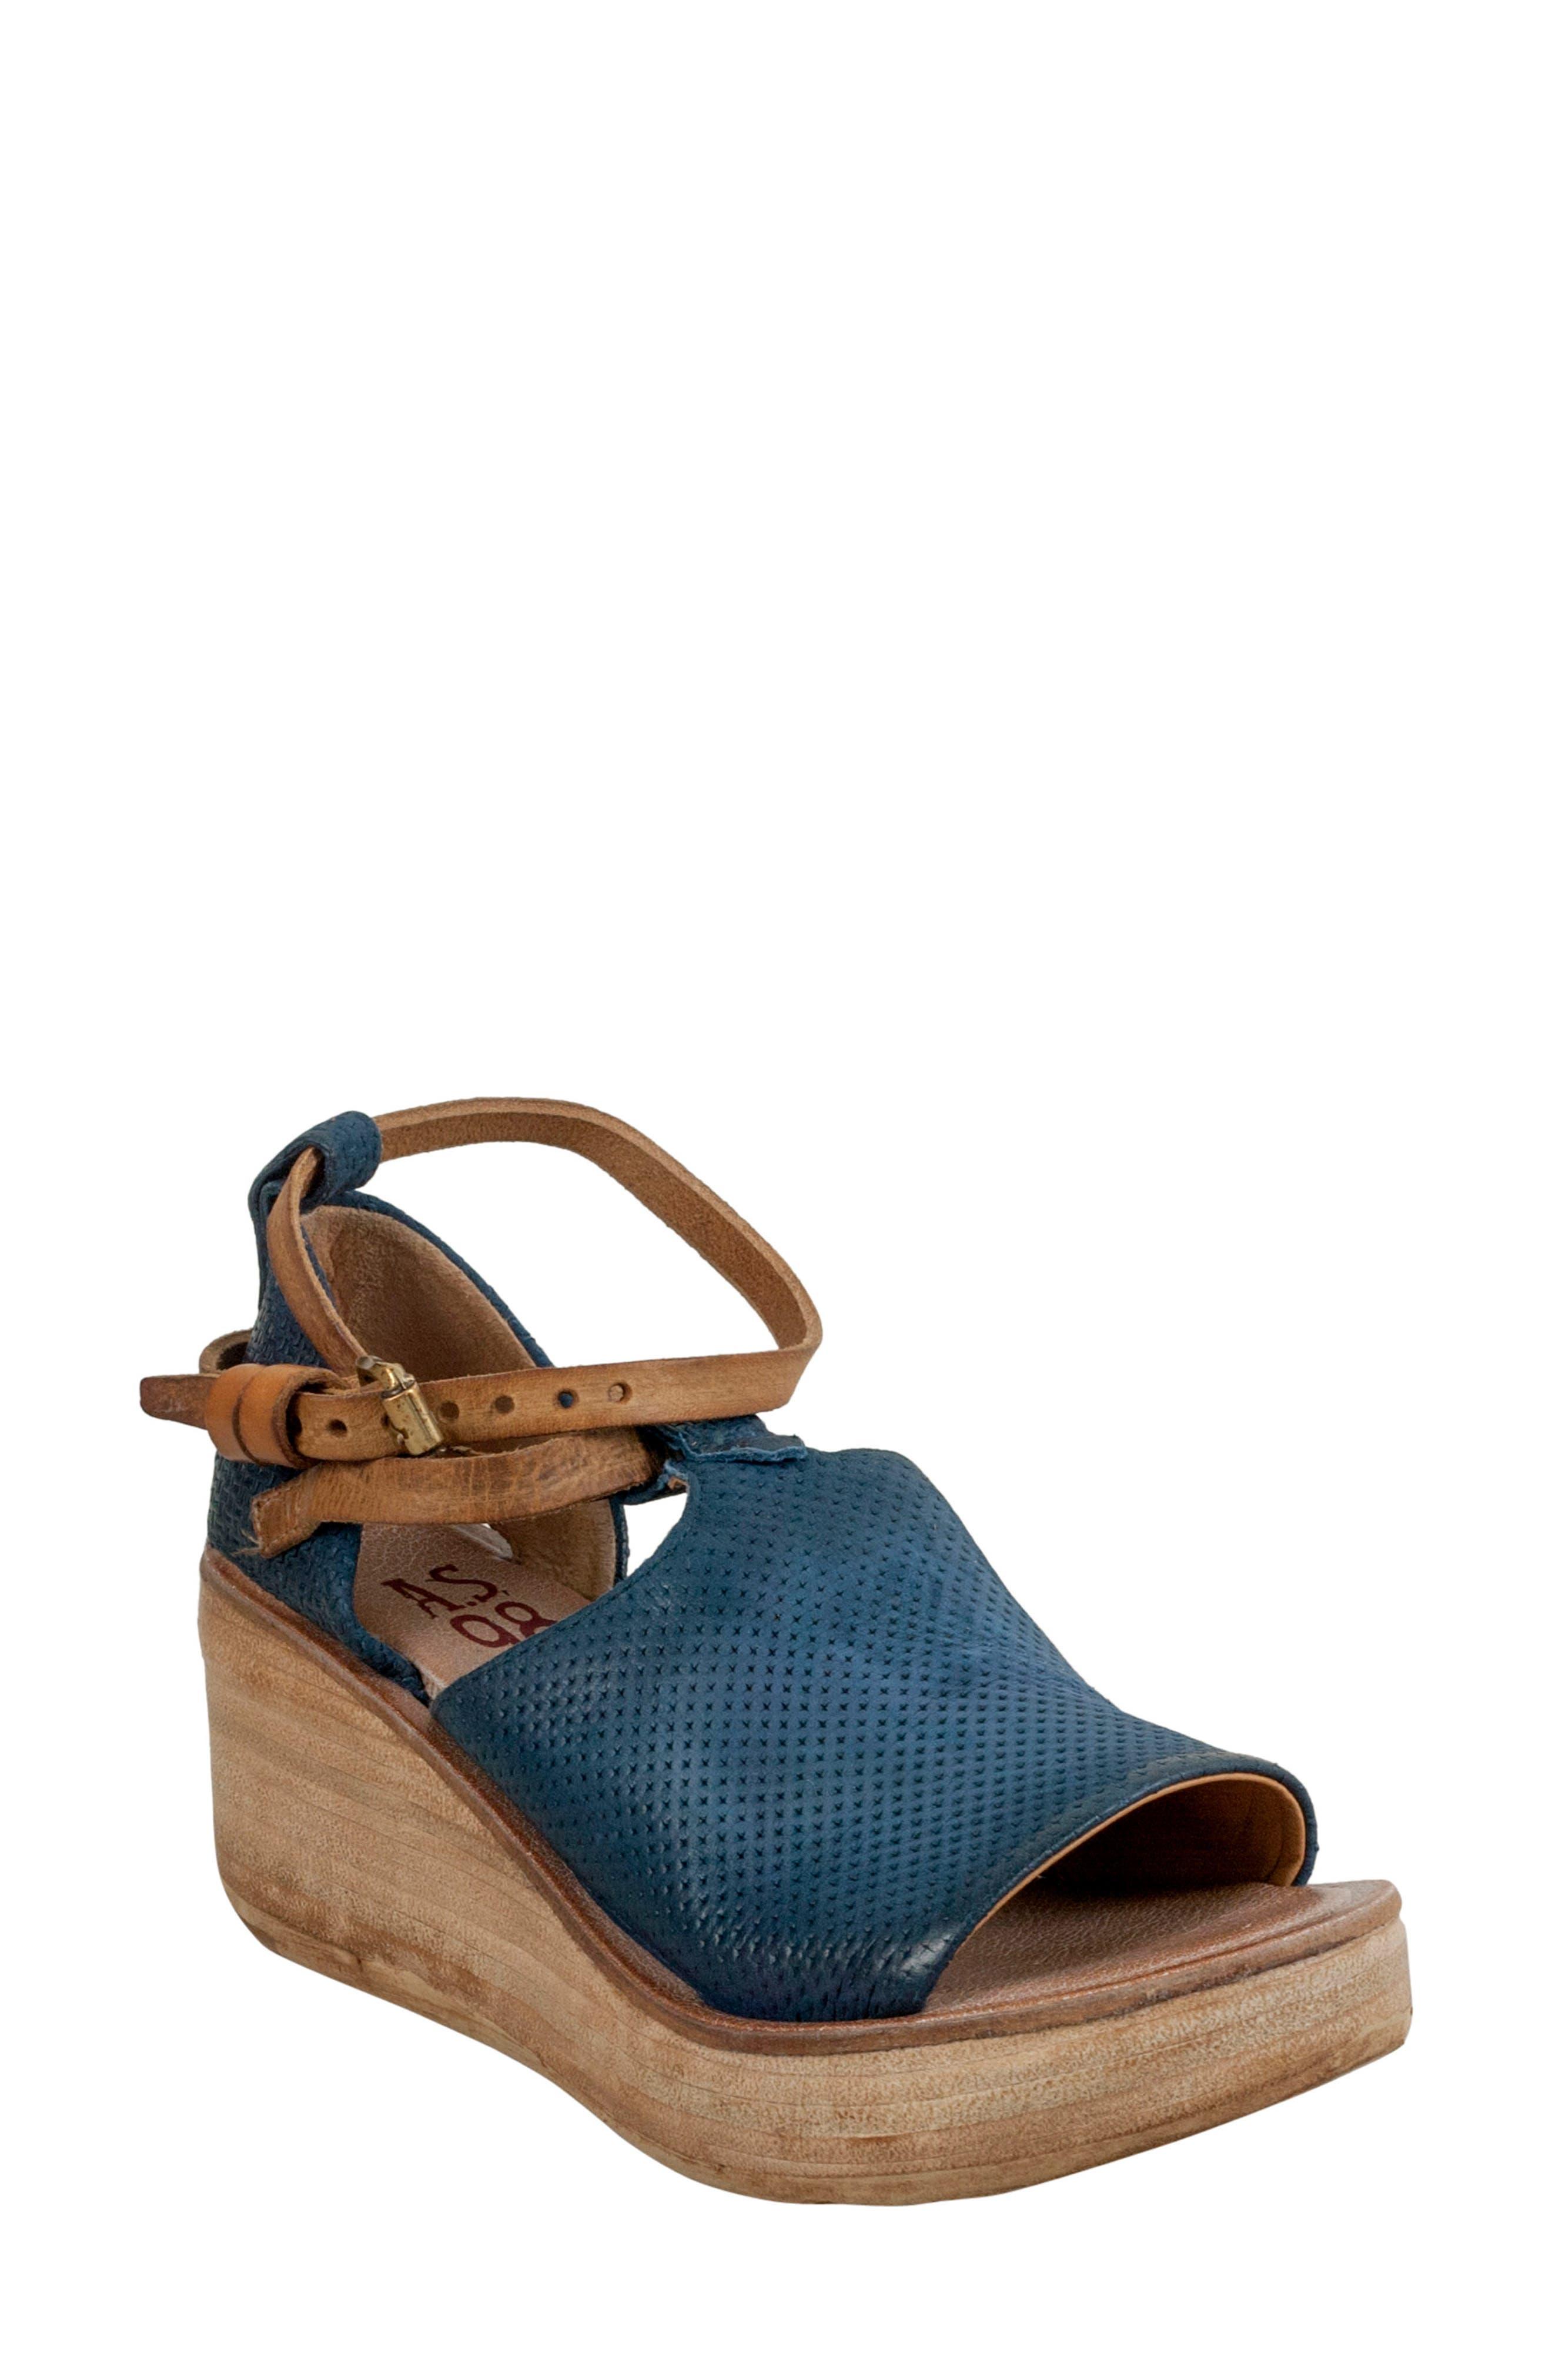 A.S.98 Nino Wedge Sandal, Blueberry